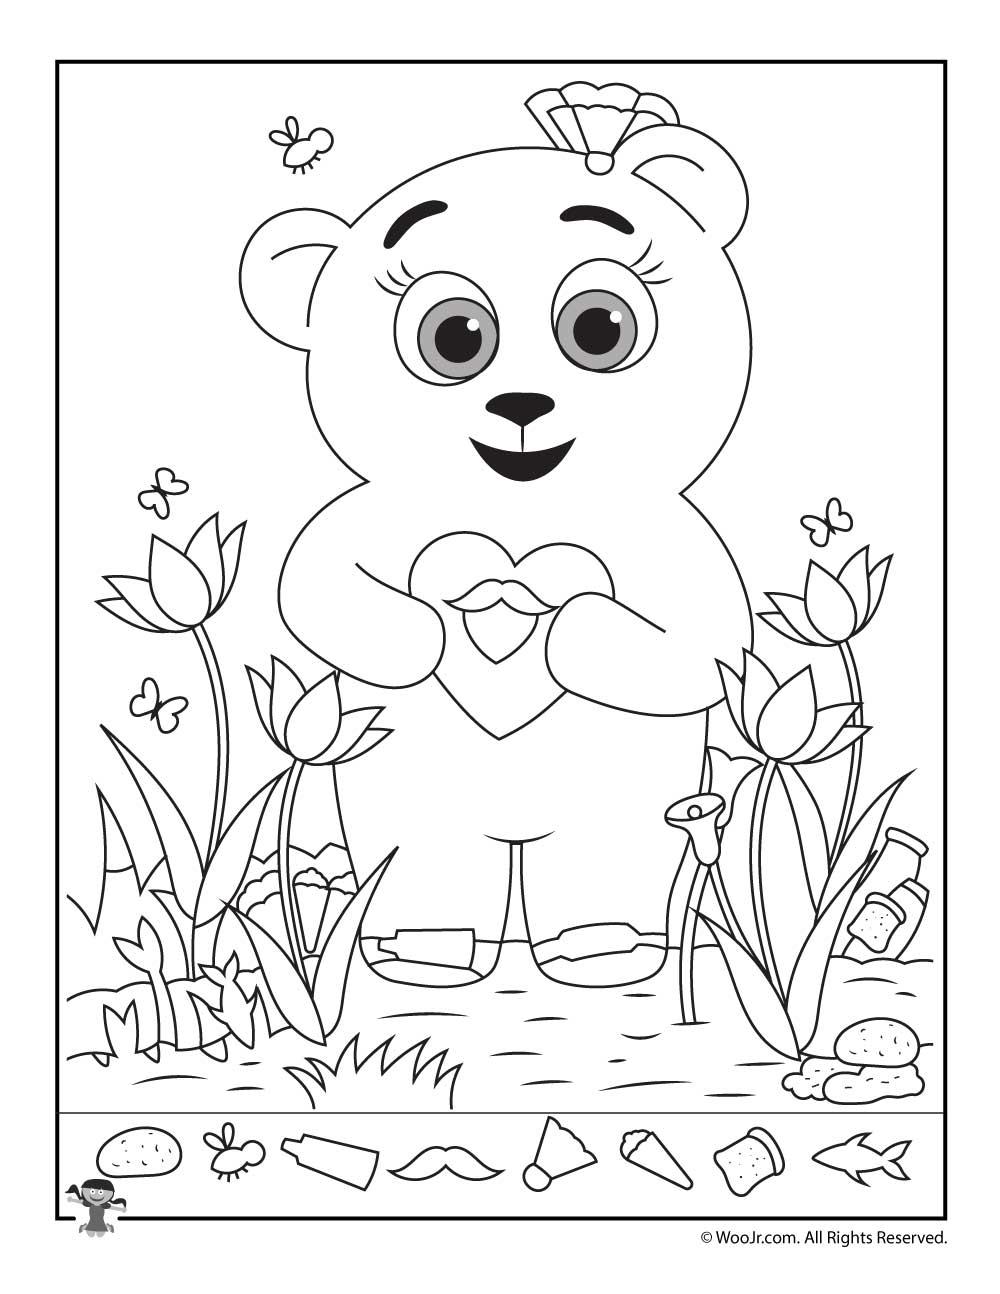 Valentine's Day Hidden Pictures Activity Pages | Woo! Jr. Kids - Free Printable Valentine Hidden Pictures